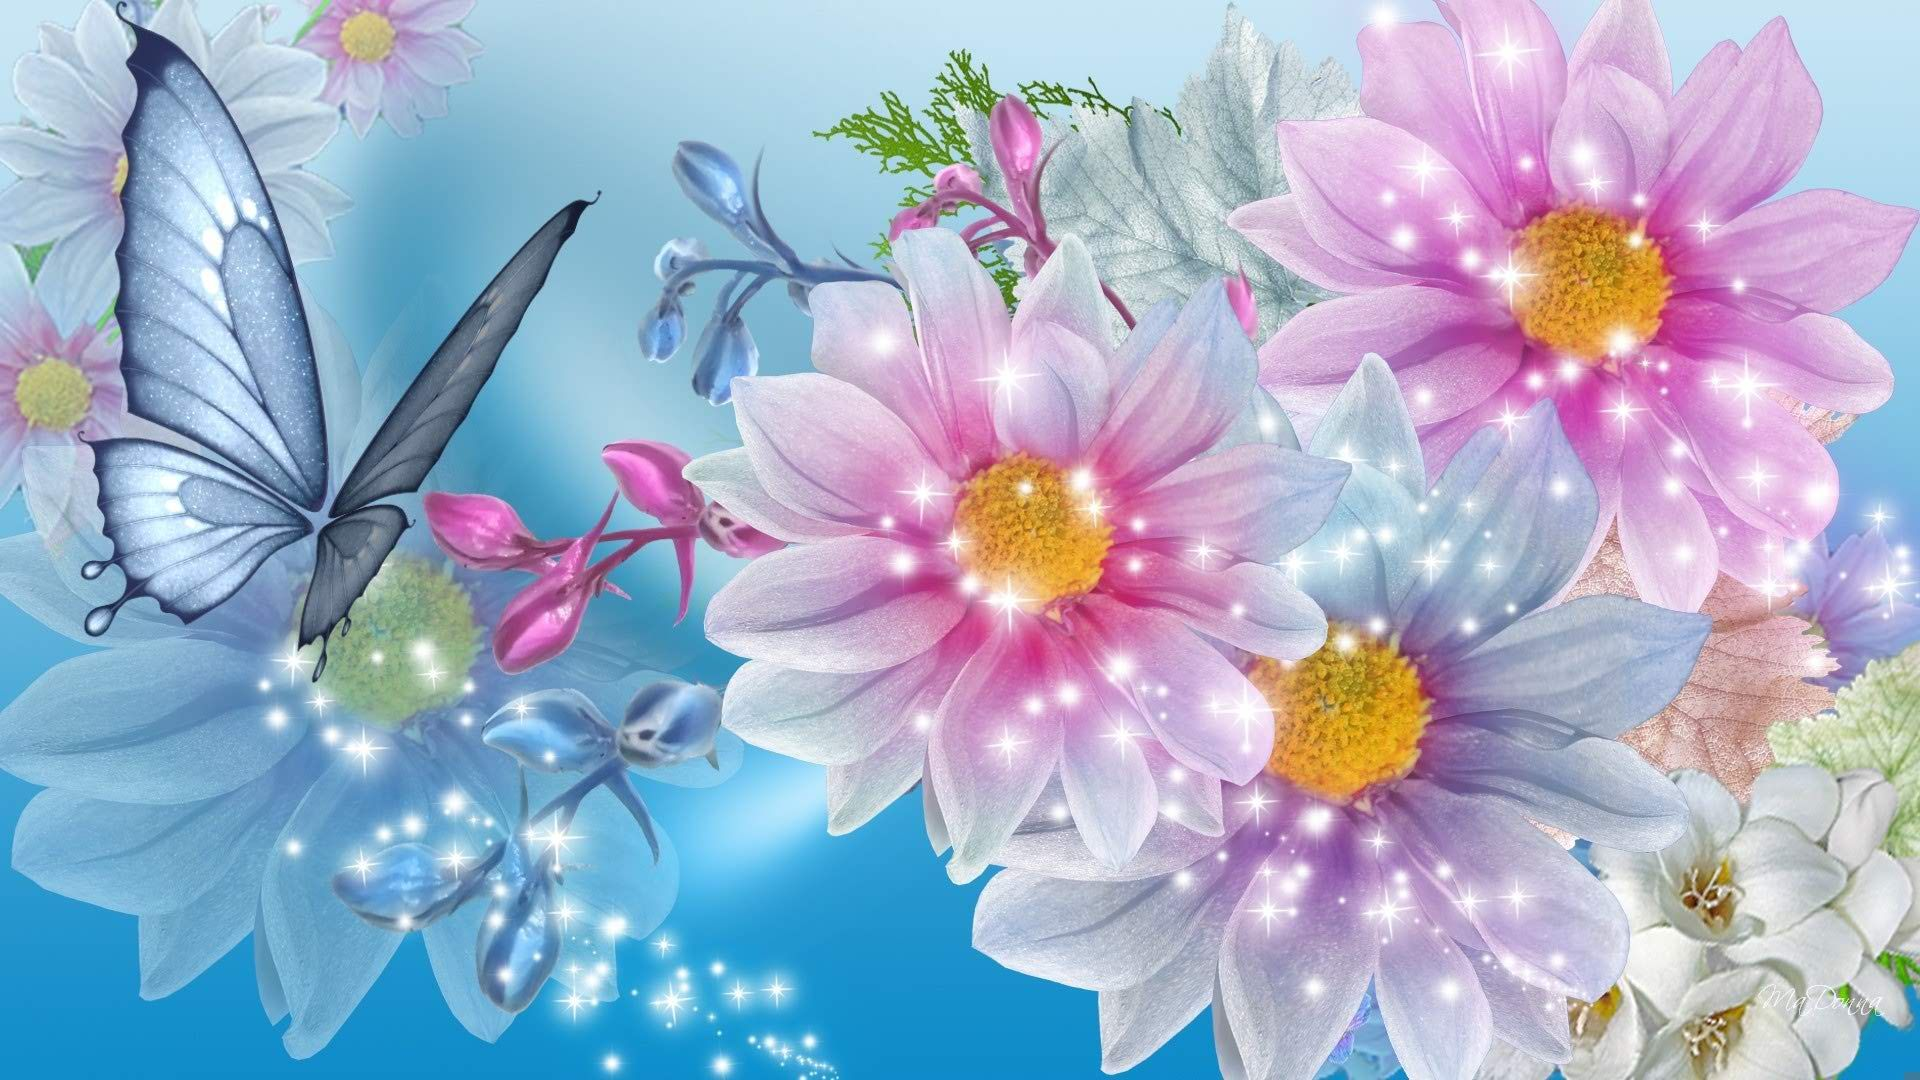 Nature Flower Wallpaper Phone For Desktop Background 1920x1080 Px 24757 KB